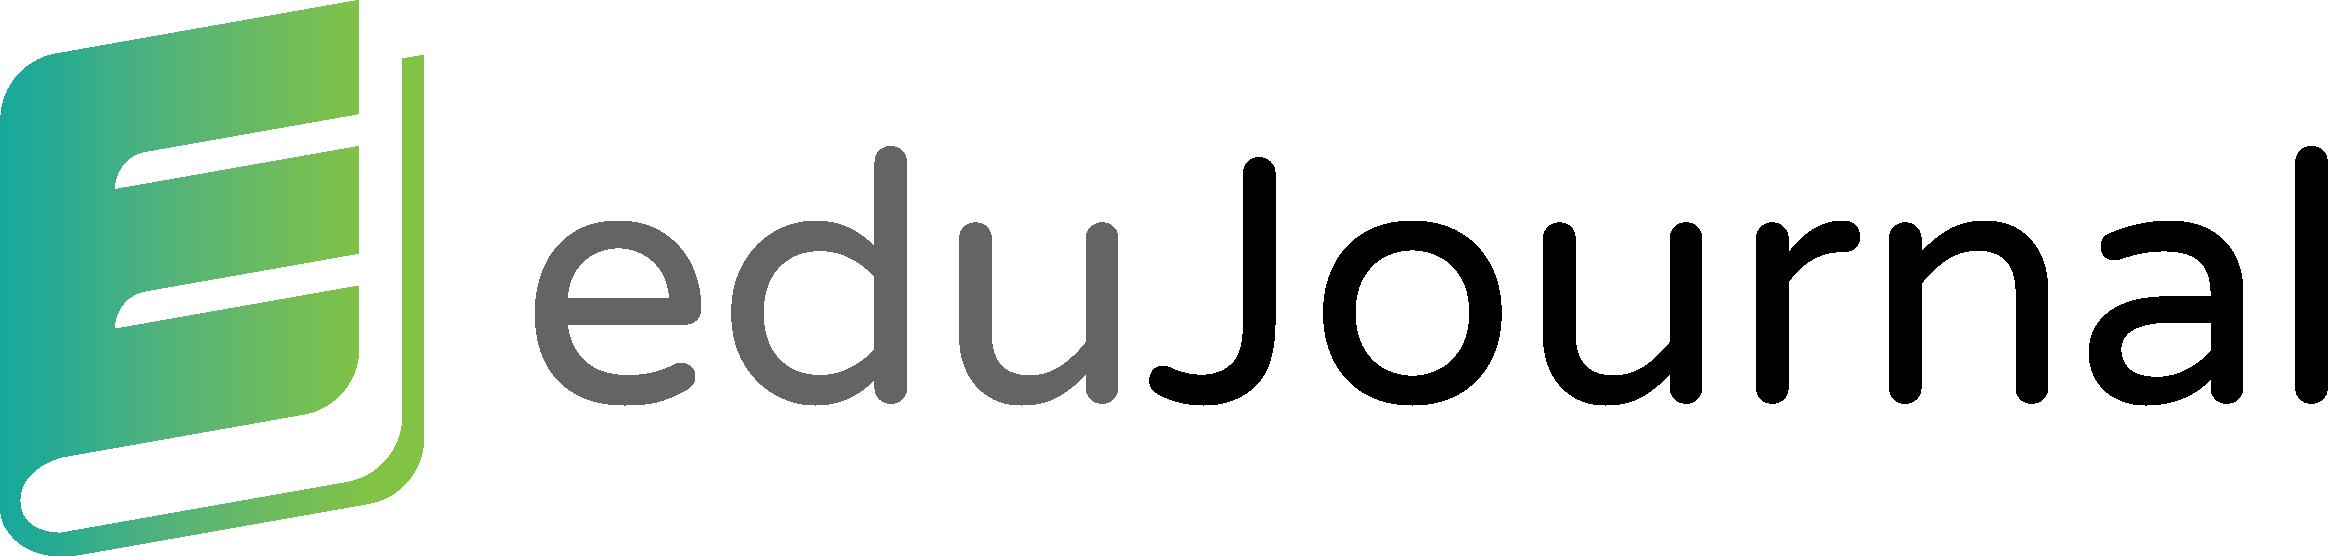 EIY Public Speaking & Professional Development | Edujournal